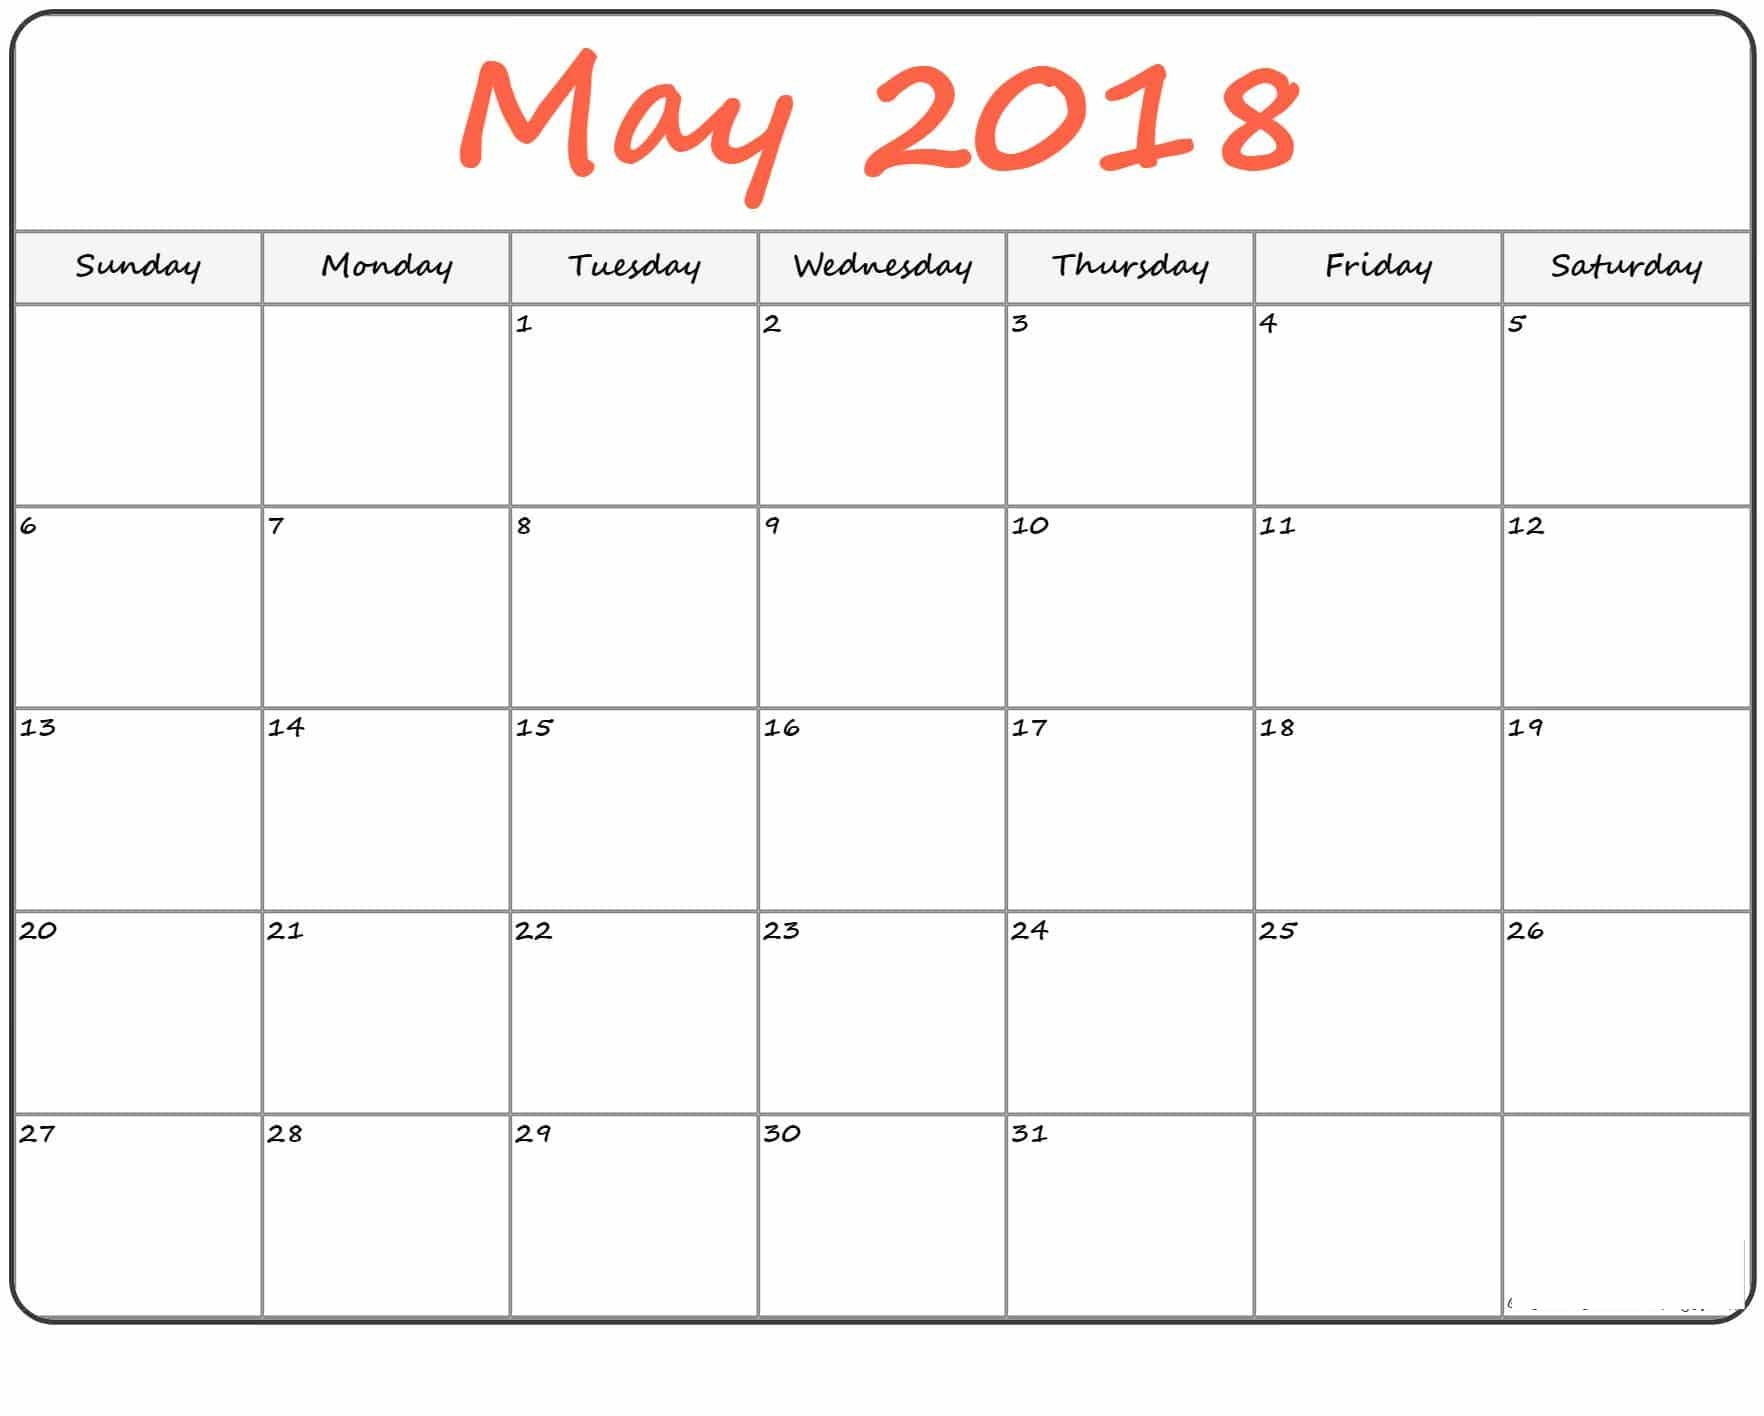 may 2018 printable calendar pdf